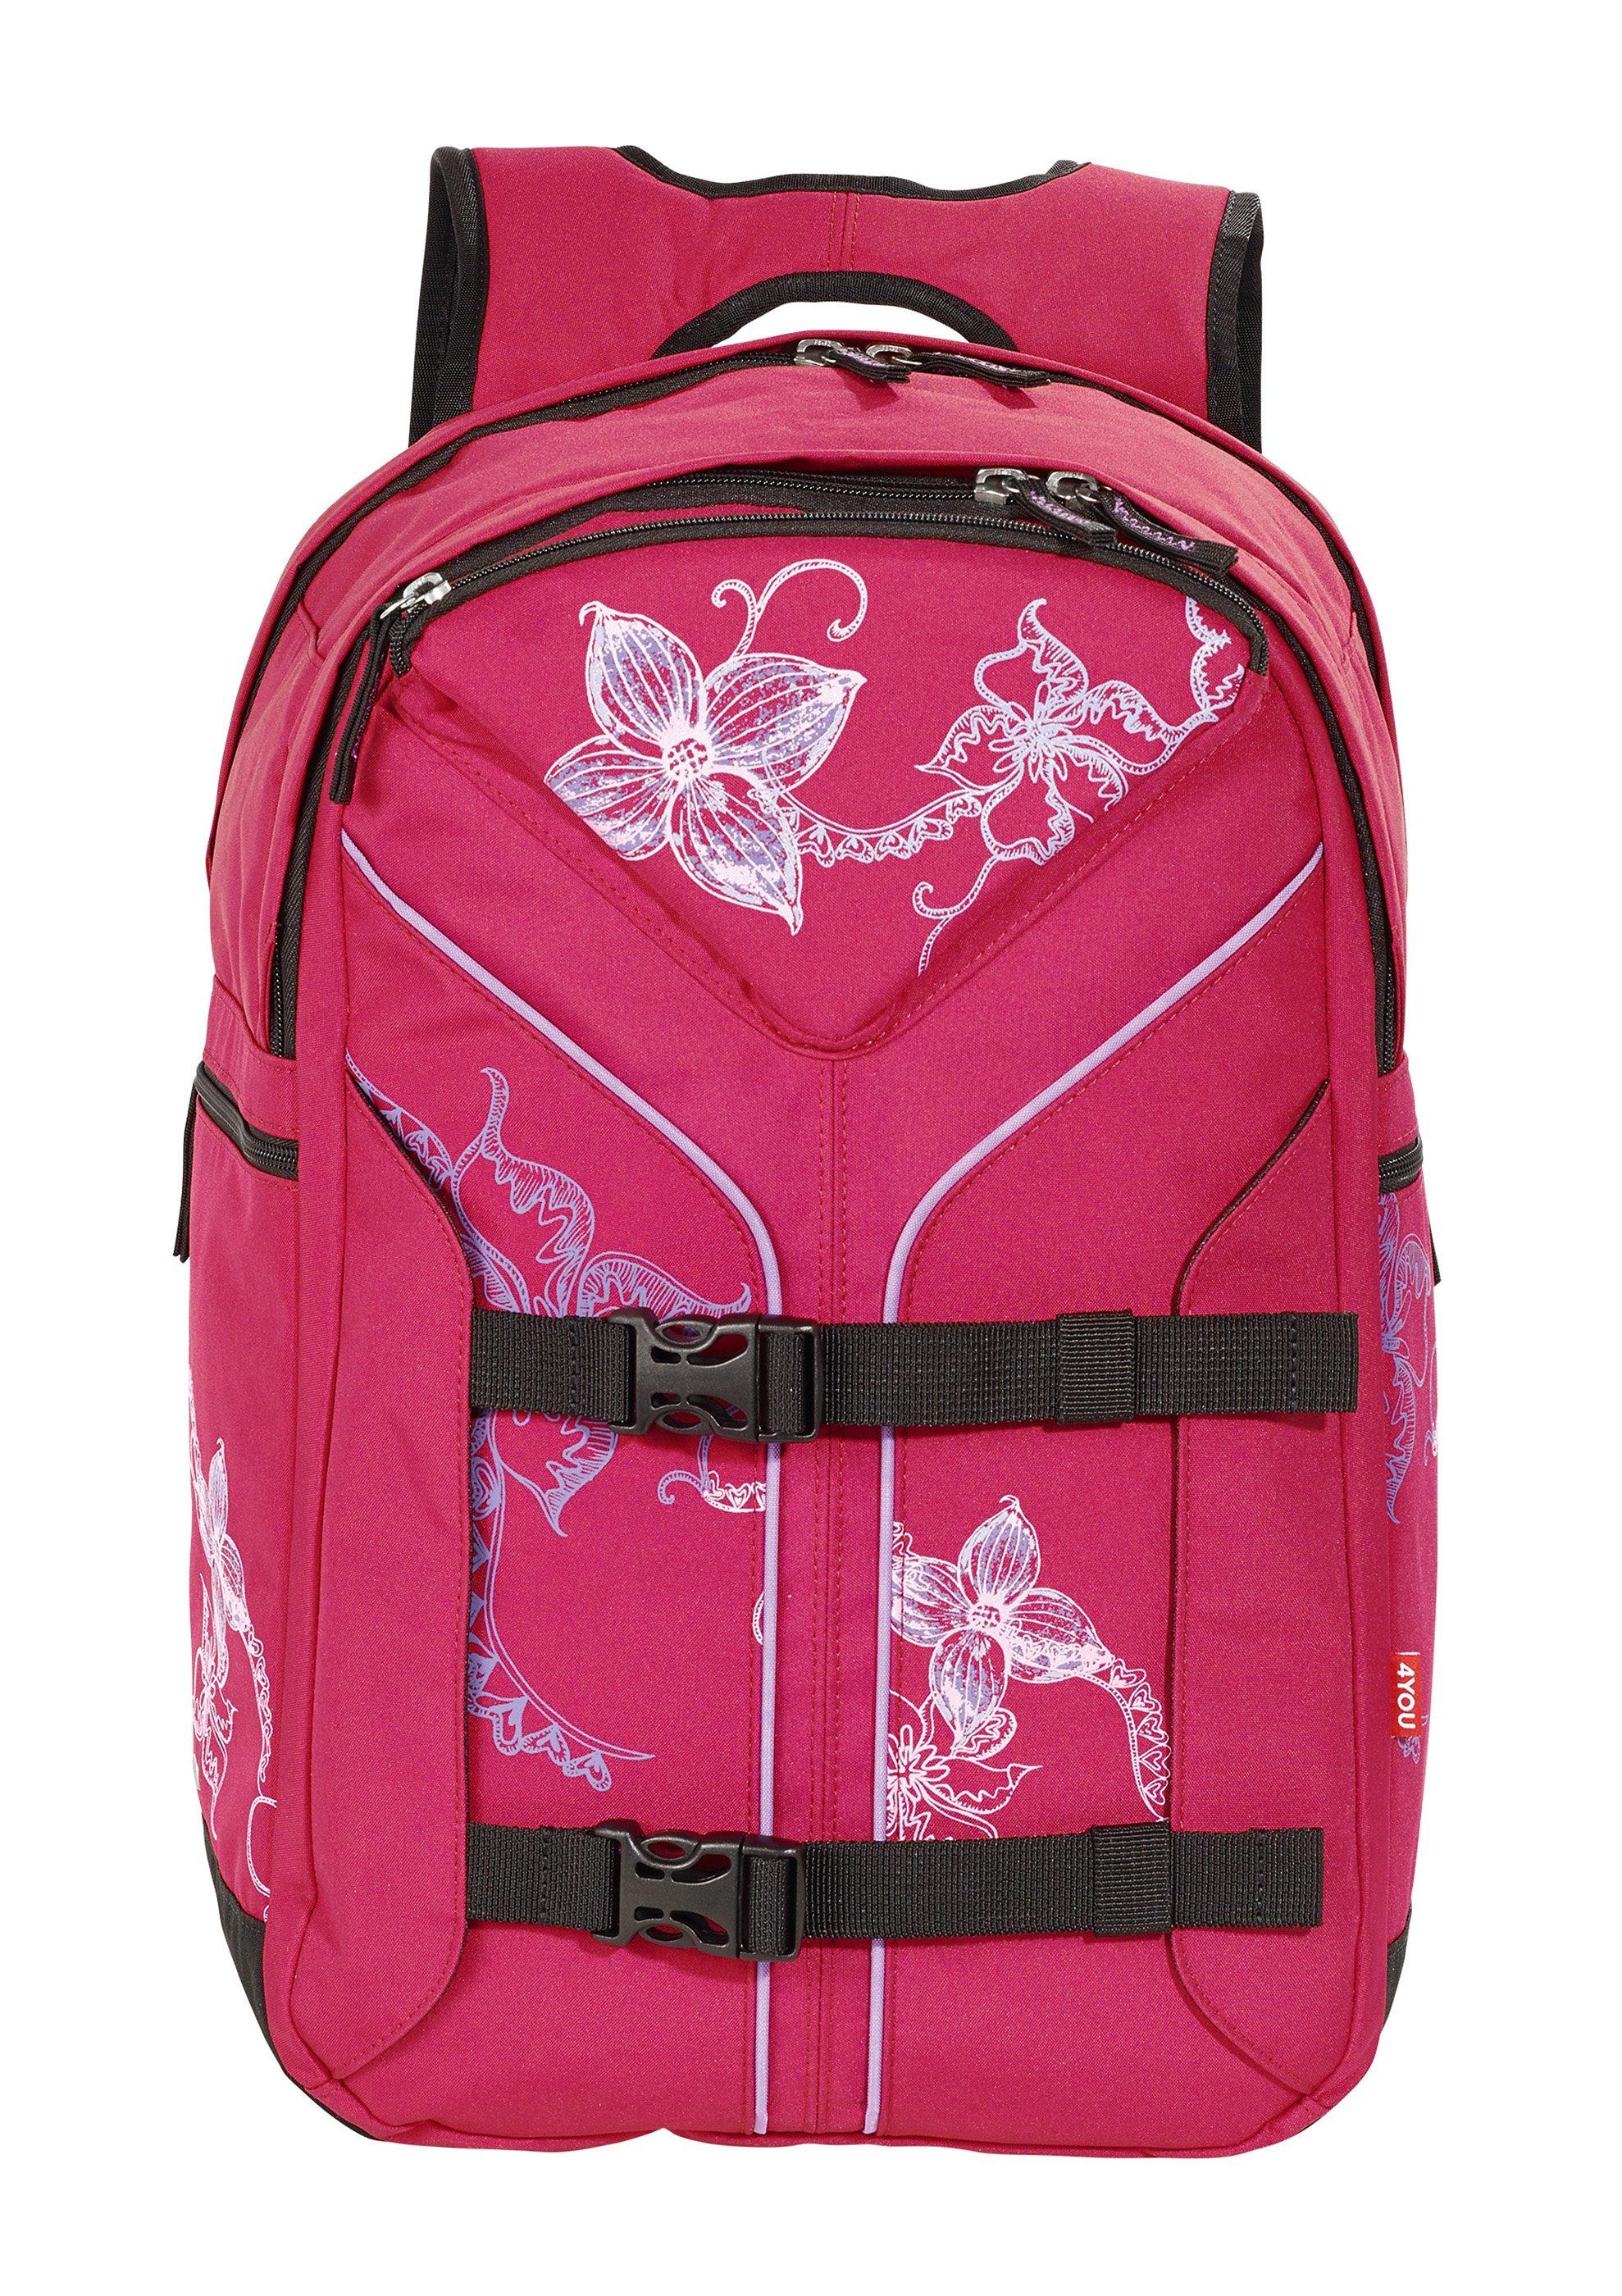 4YOU Schulrucksack, »Rucksack Boomerang Sport - Flower Lace«